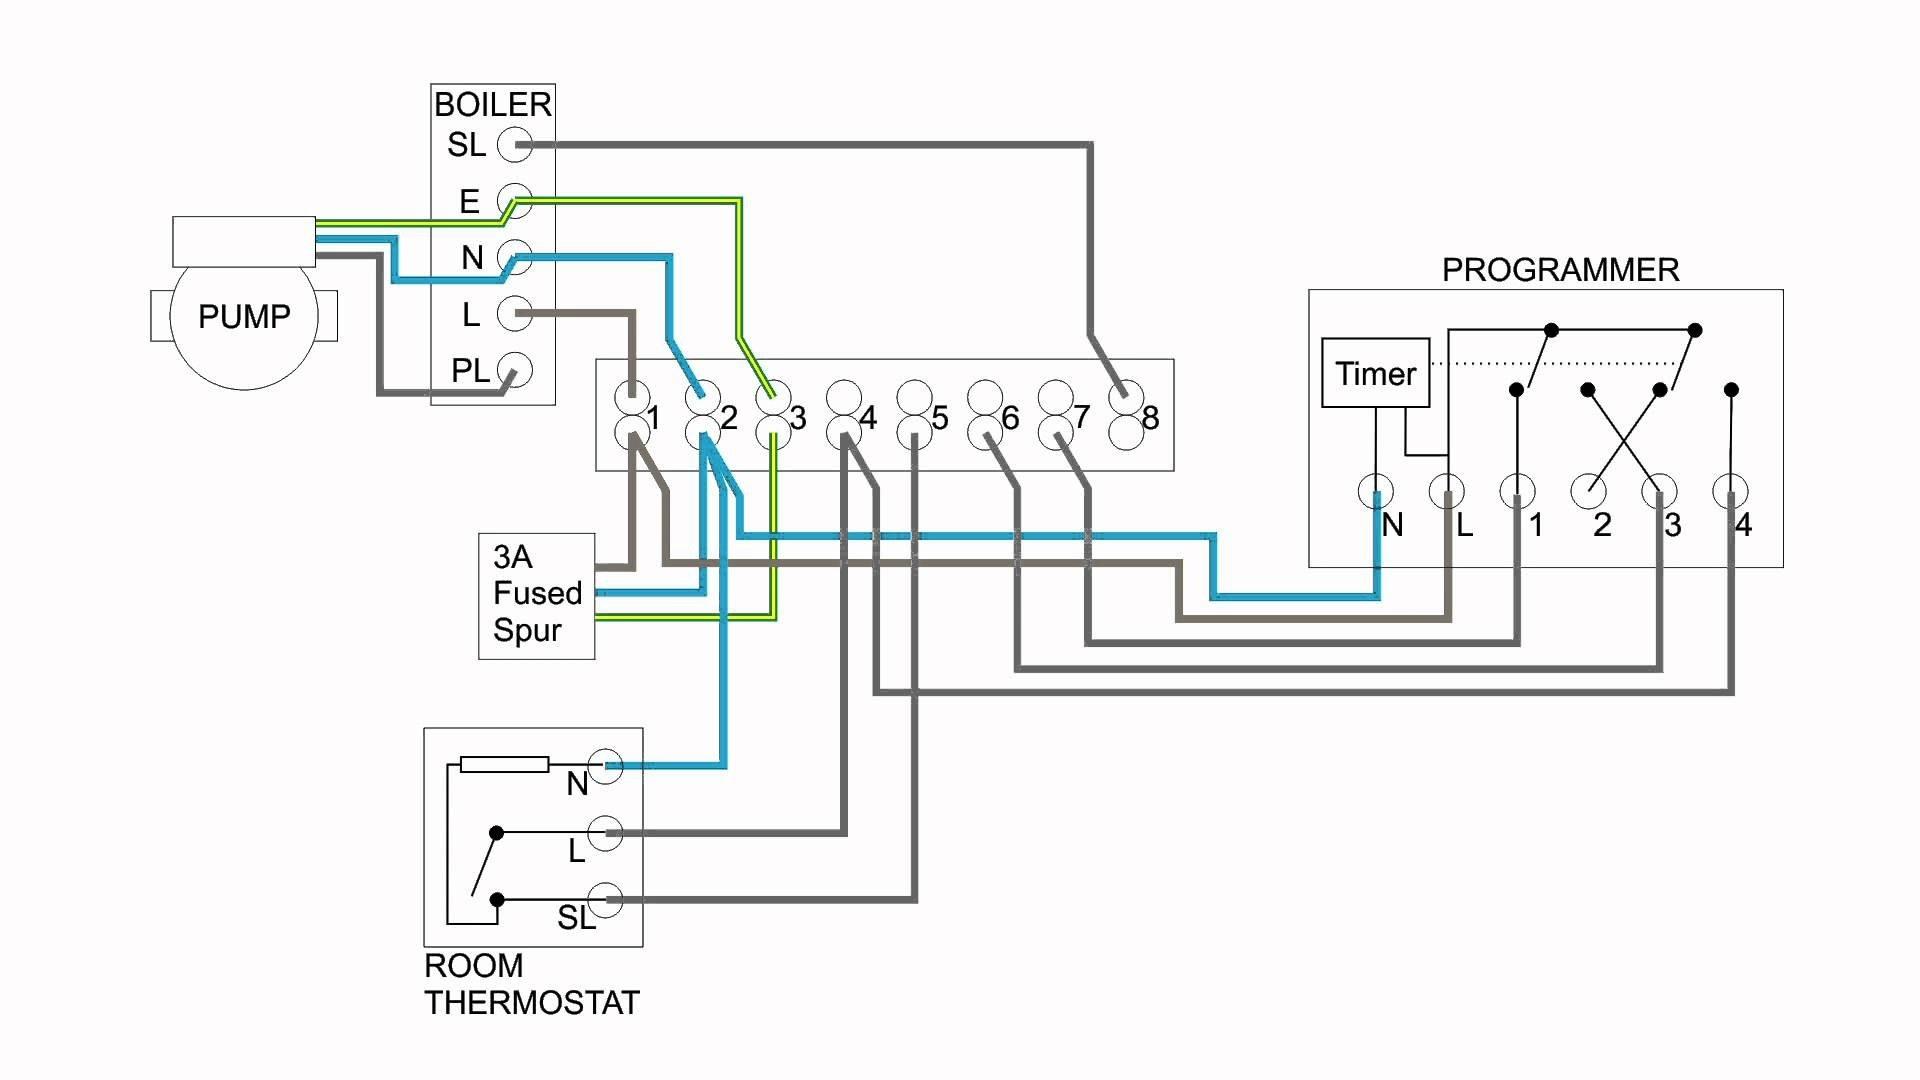 chromalox heater wiring diagram Download-Chromalox Immersion Heater Wiring Diagram New Space Heater Wiring Diagram Sample 1-d